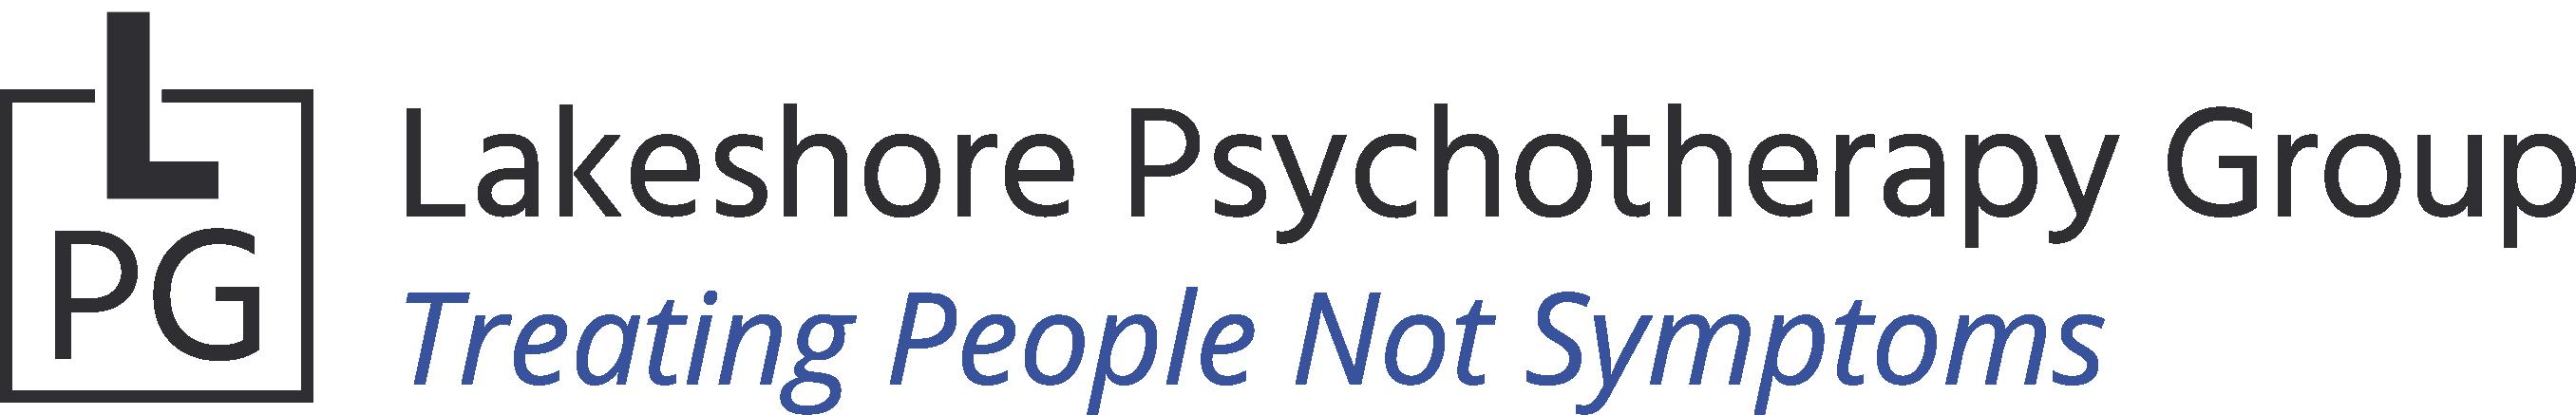 Lakeshore Psychotherapy Group LLC Header Logo